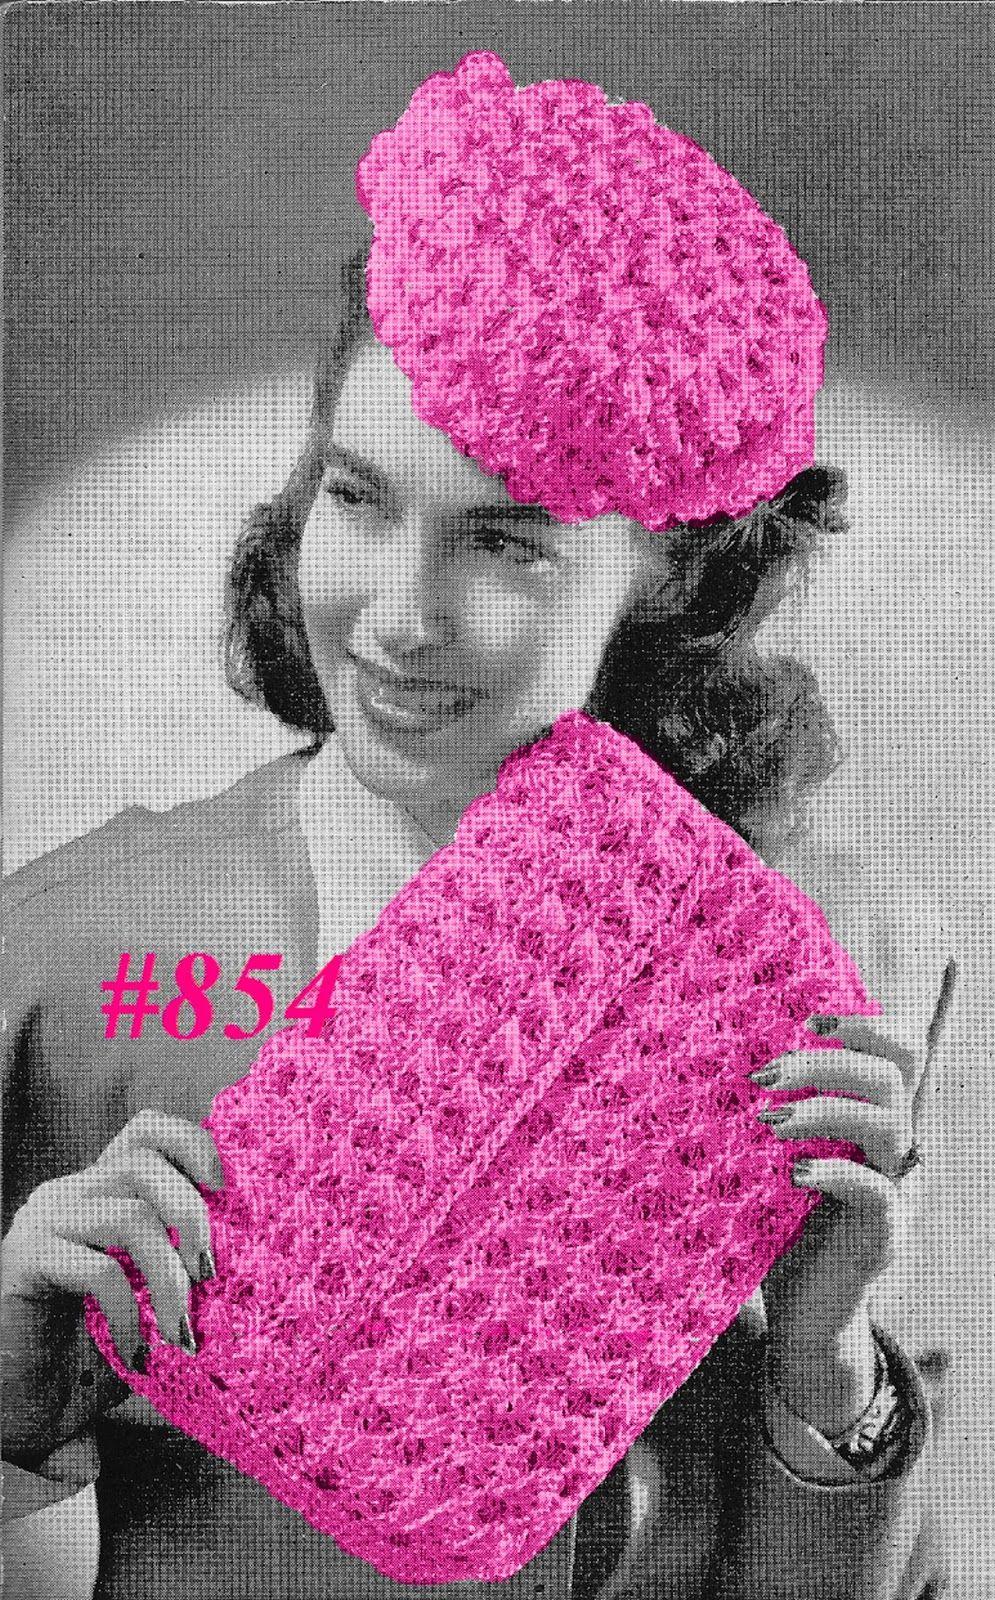 Miss Julia's Vintage Patterns: #854 - 1940s Rosette Hat & Clutch ...